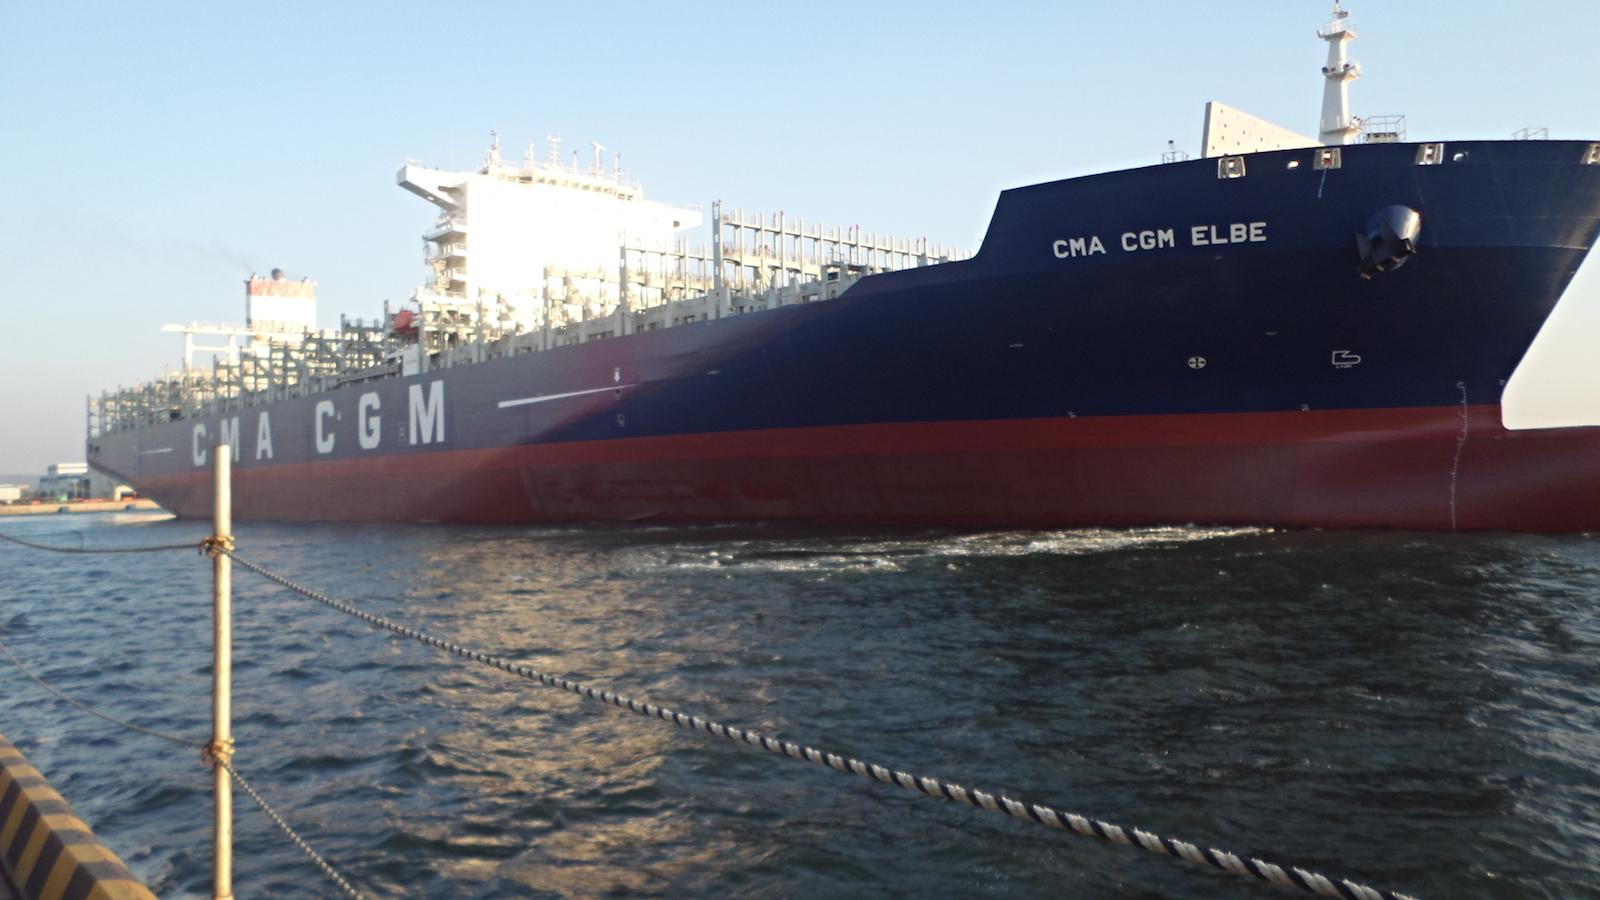 The CMA CGM ELBE enters the CMA CGM fleet